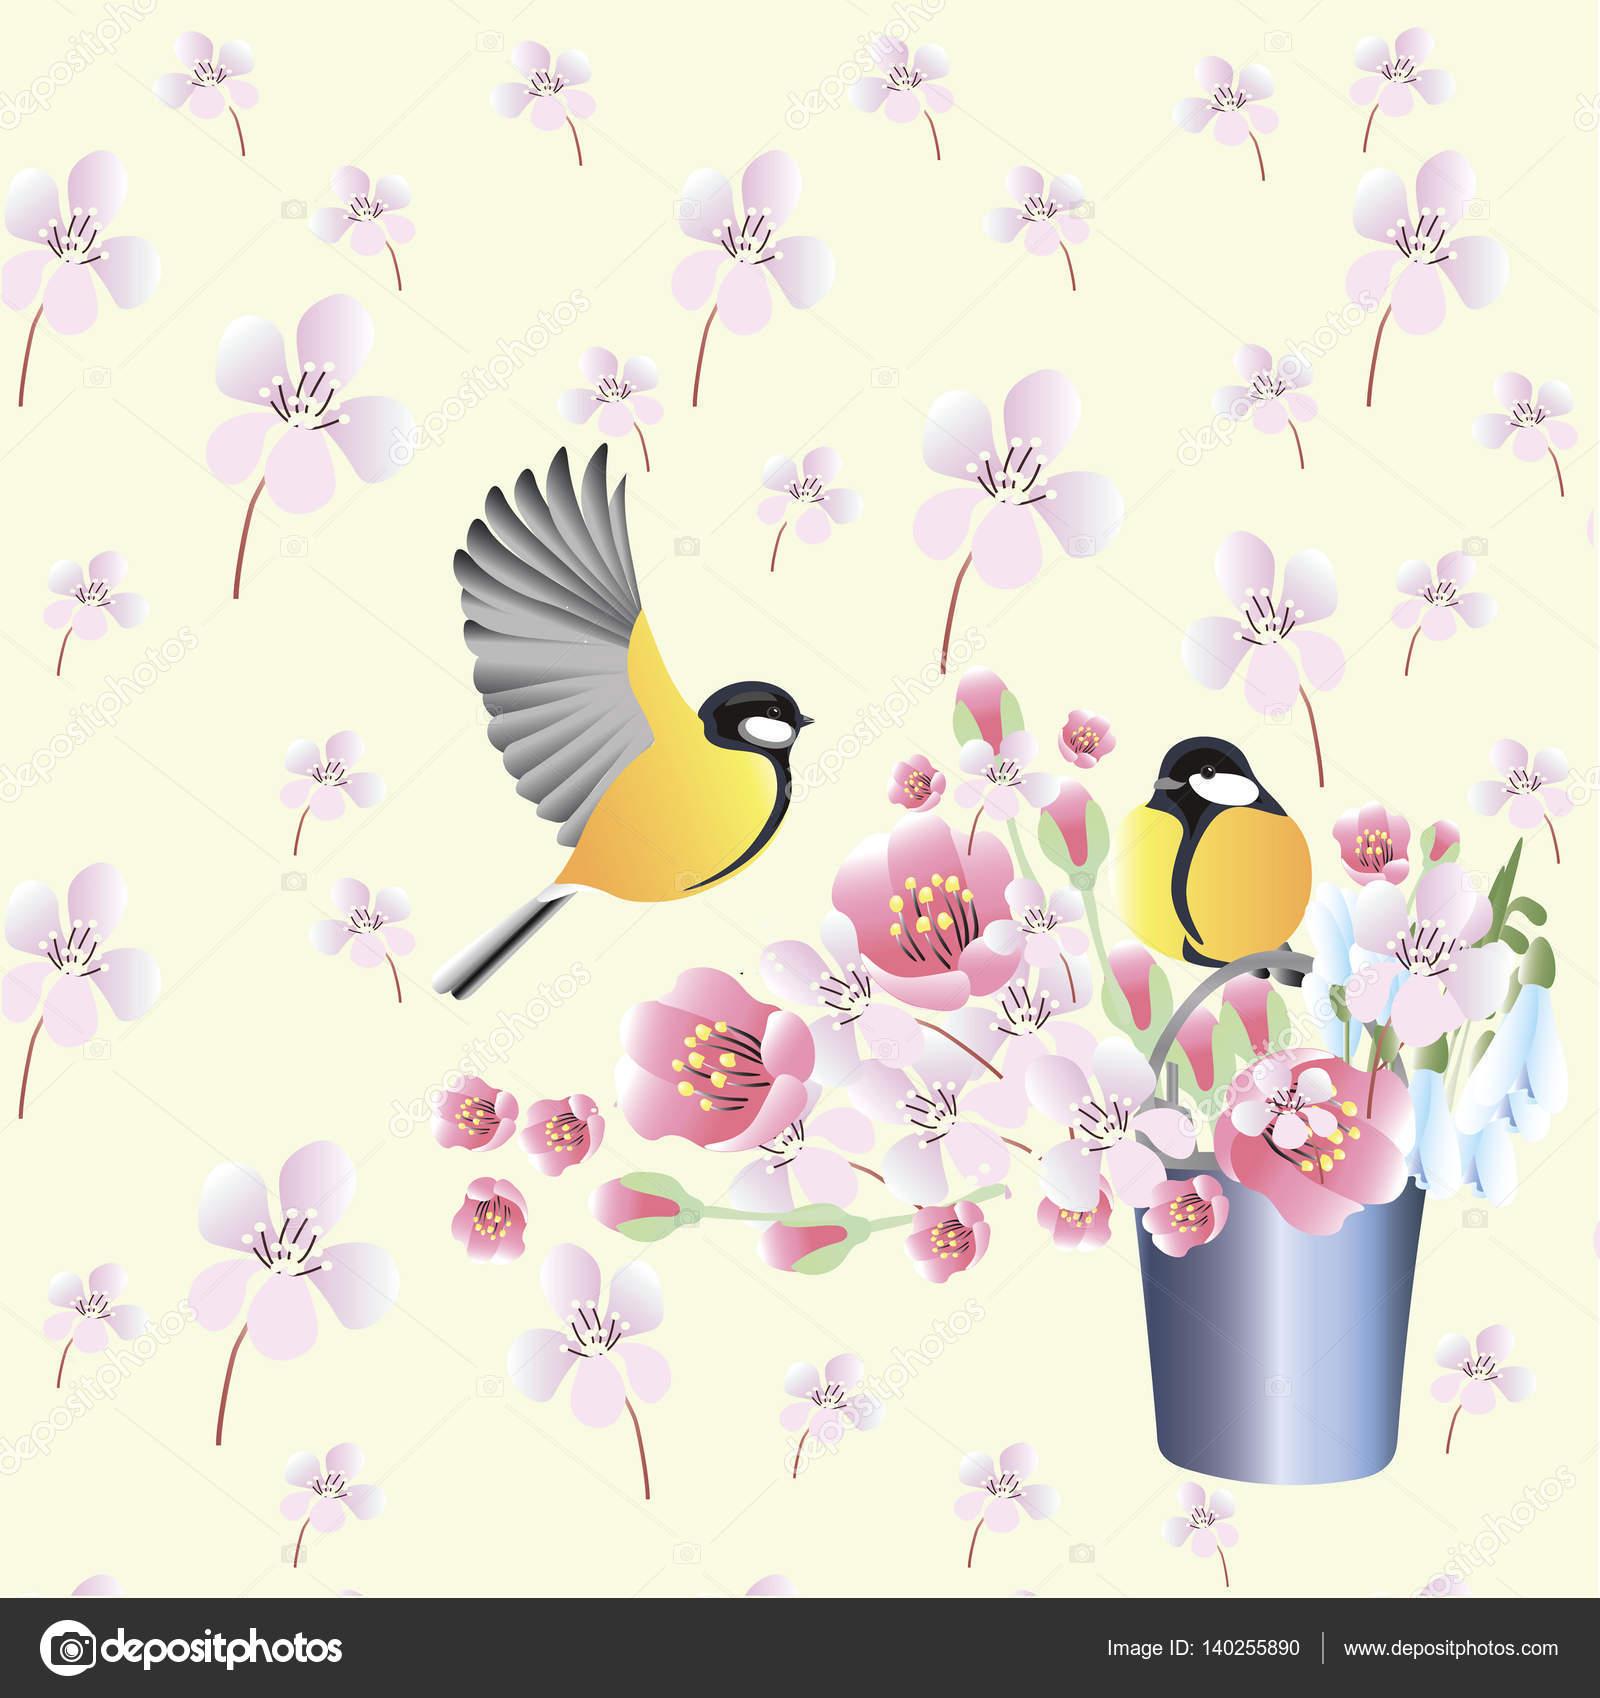 Wallpaper With Birds Spring Wallpaper With Birdsvector Background Stock Vector